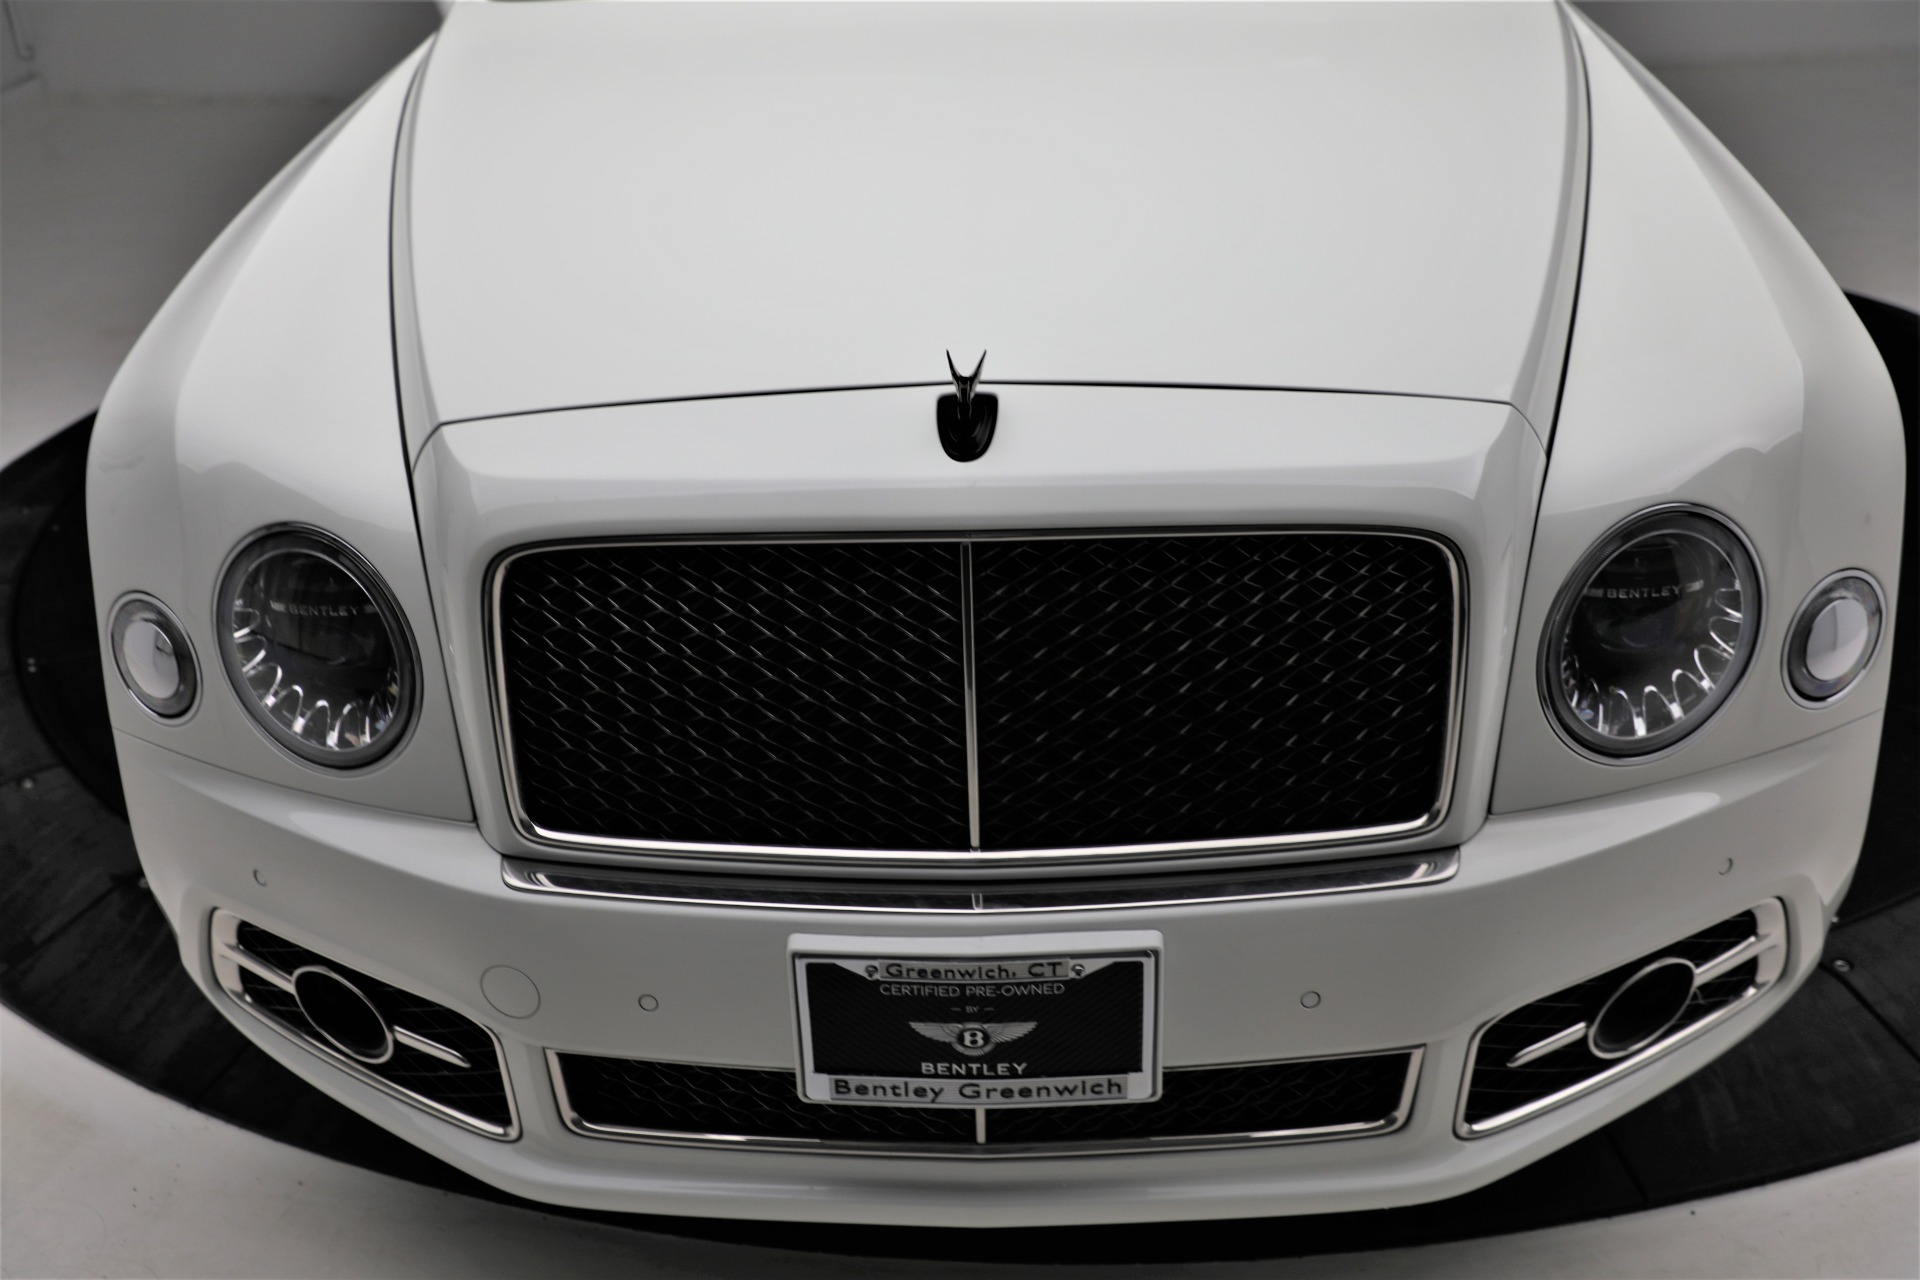 Used 2018 Bentley Mulsanne Speed For Sale In Westport, CT 2075_p12